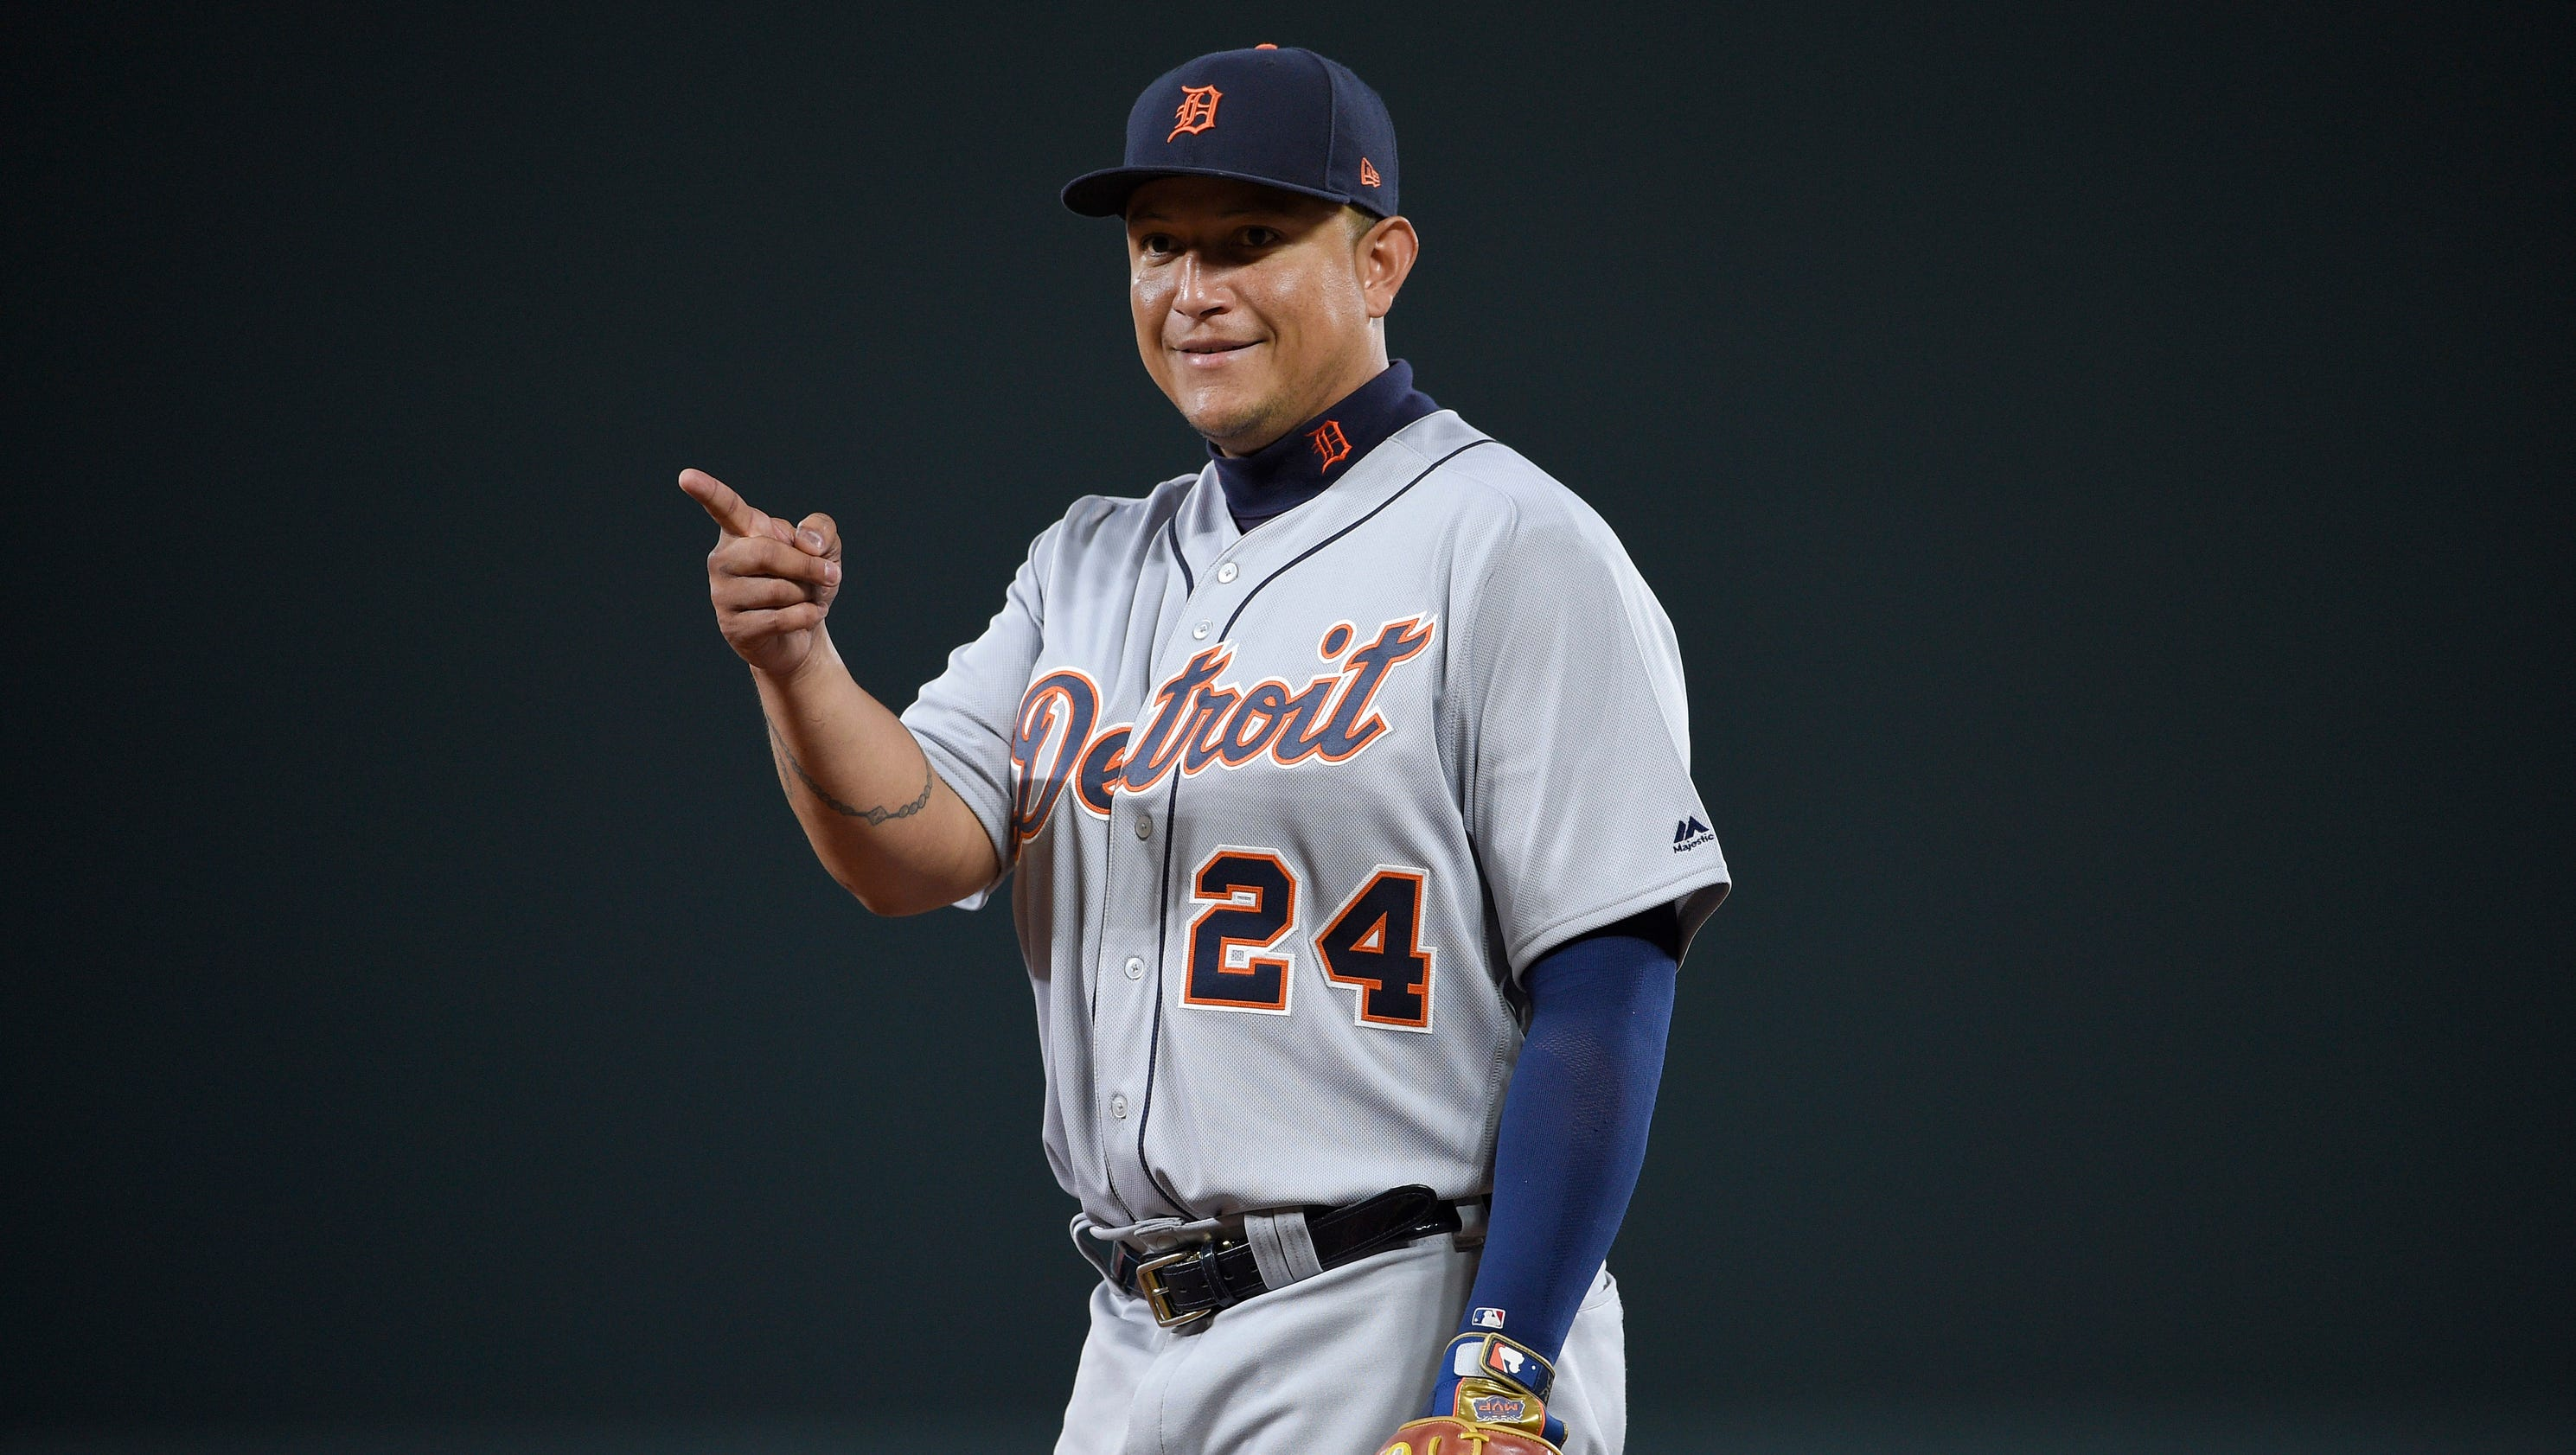 636489692440880691-ap-tigers-orioles-baseball-b